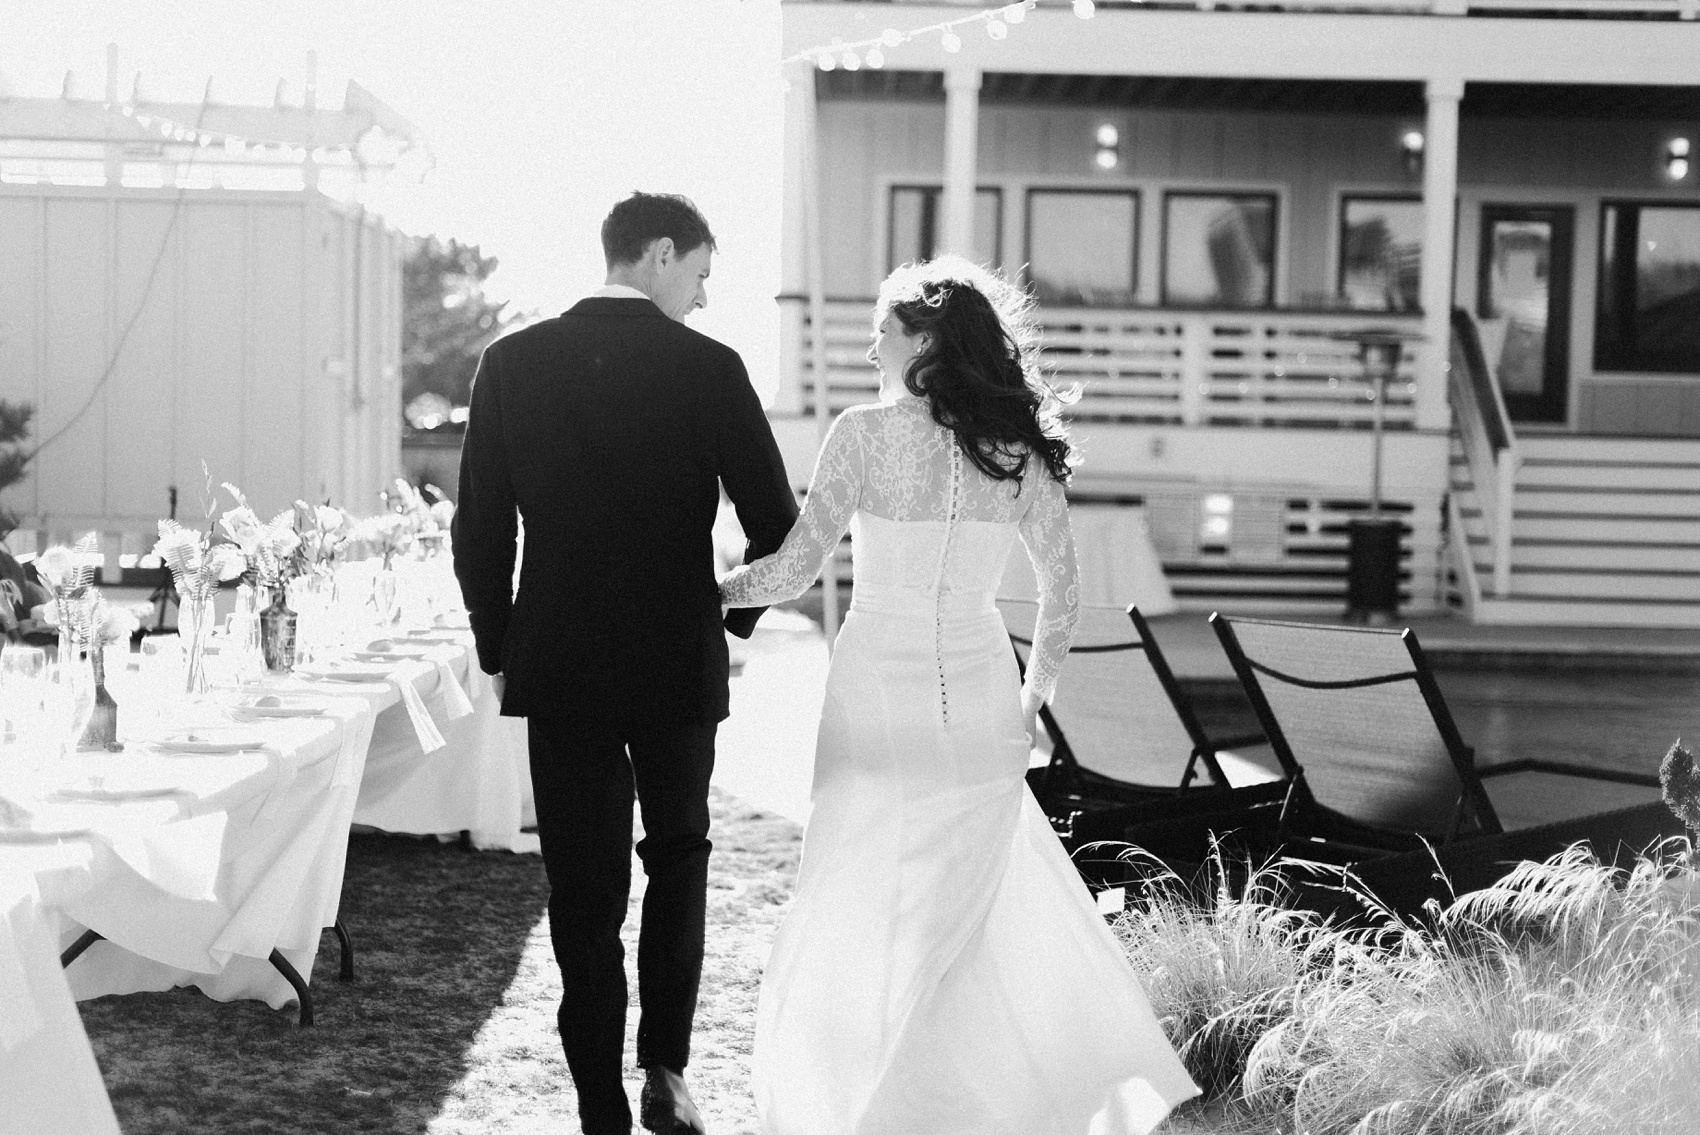 outerbanks_wedding_photographer_1289.jpg